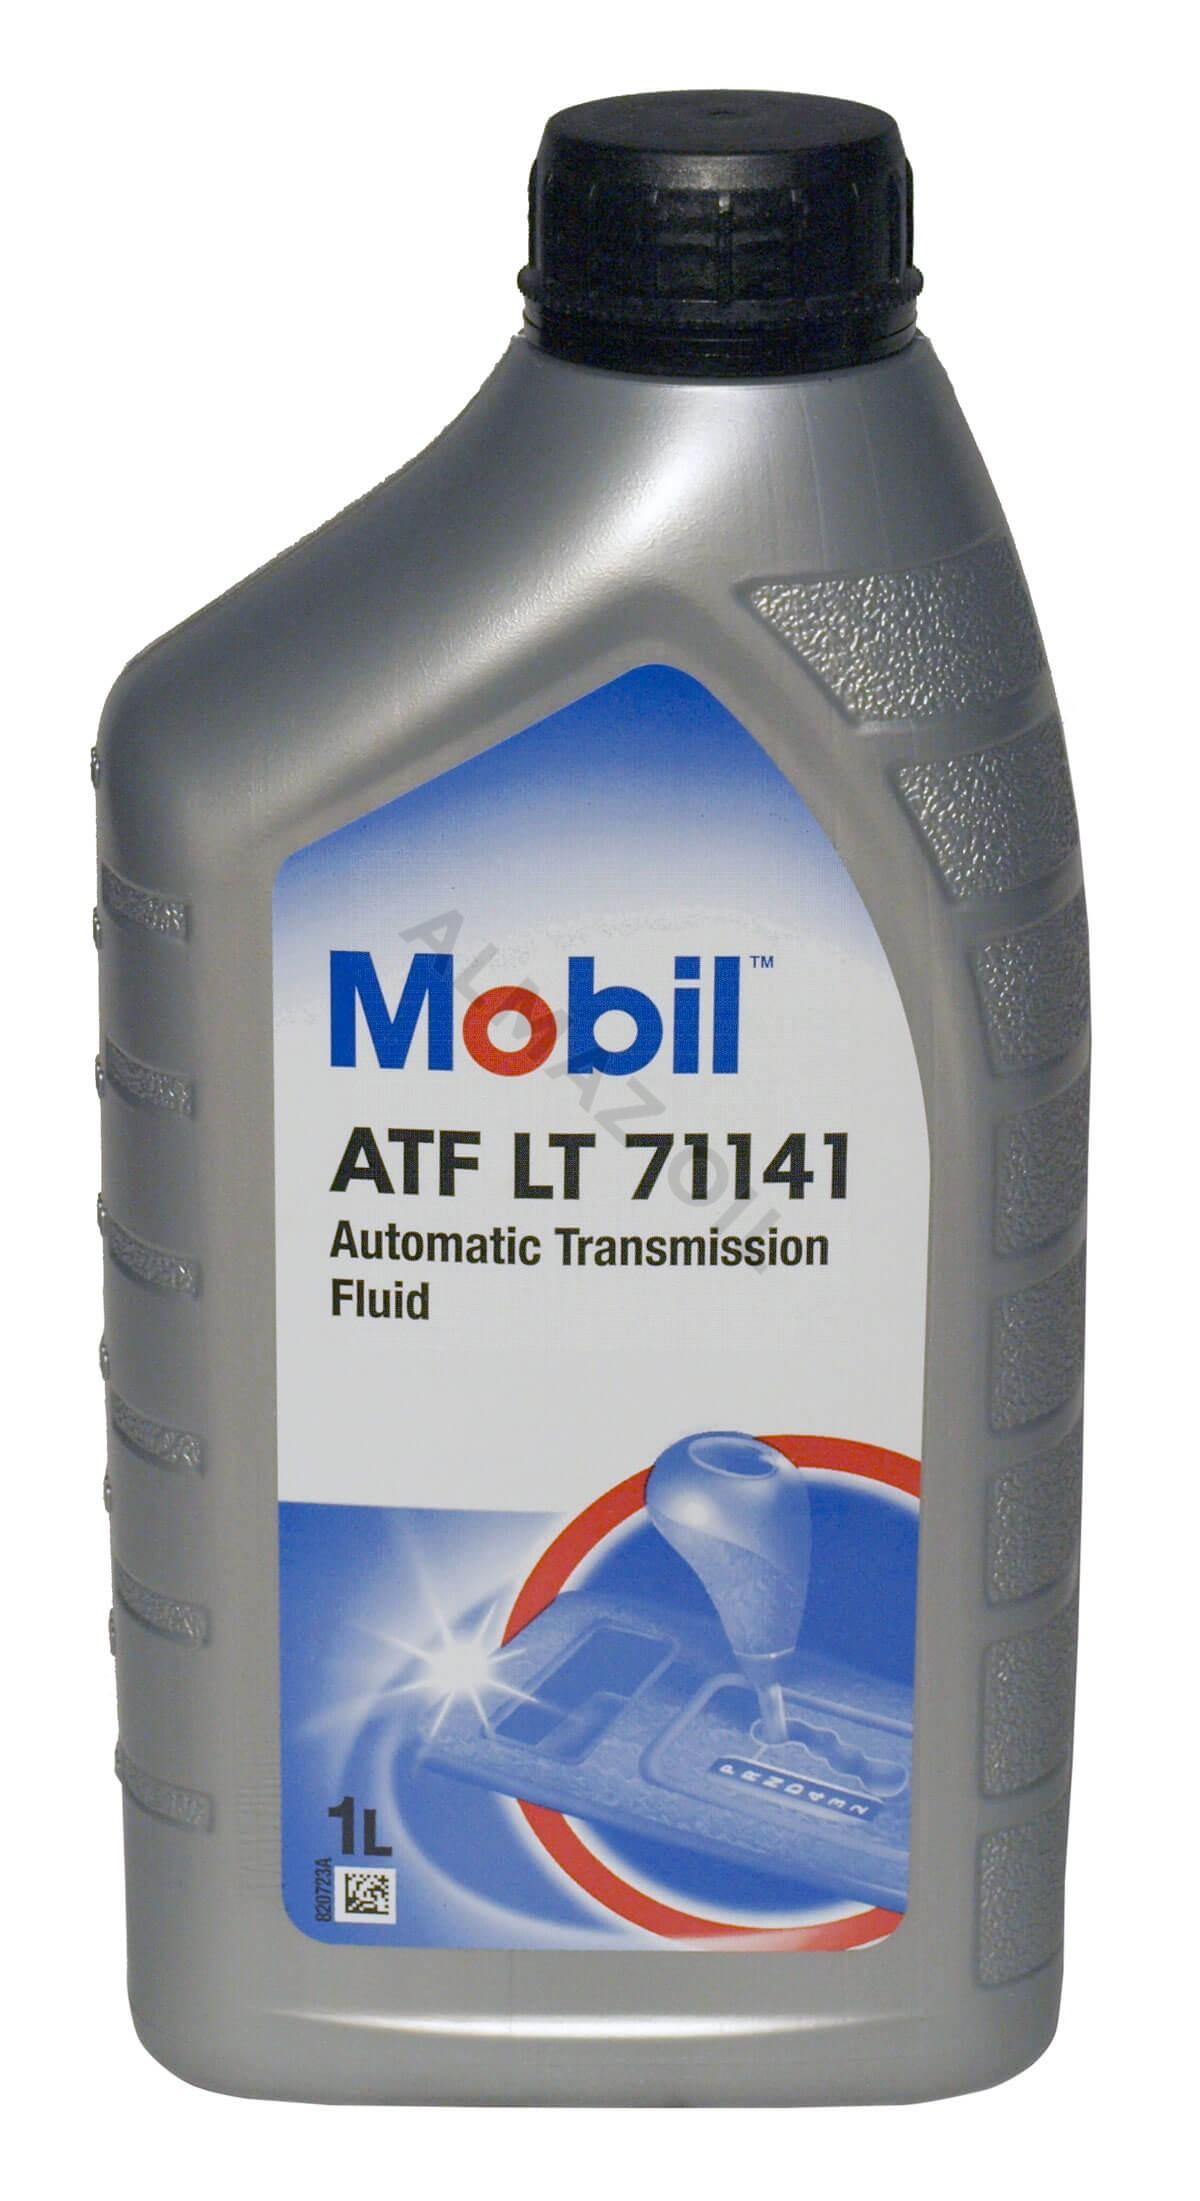 Mobil ATF LT71141